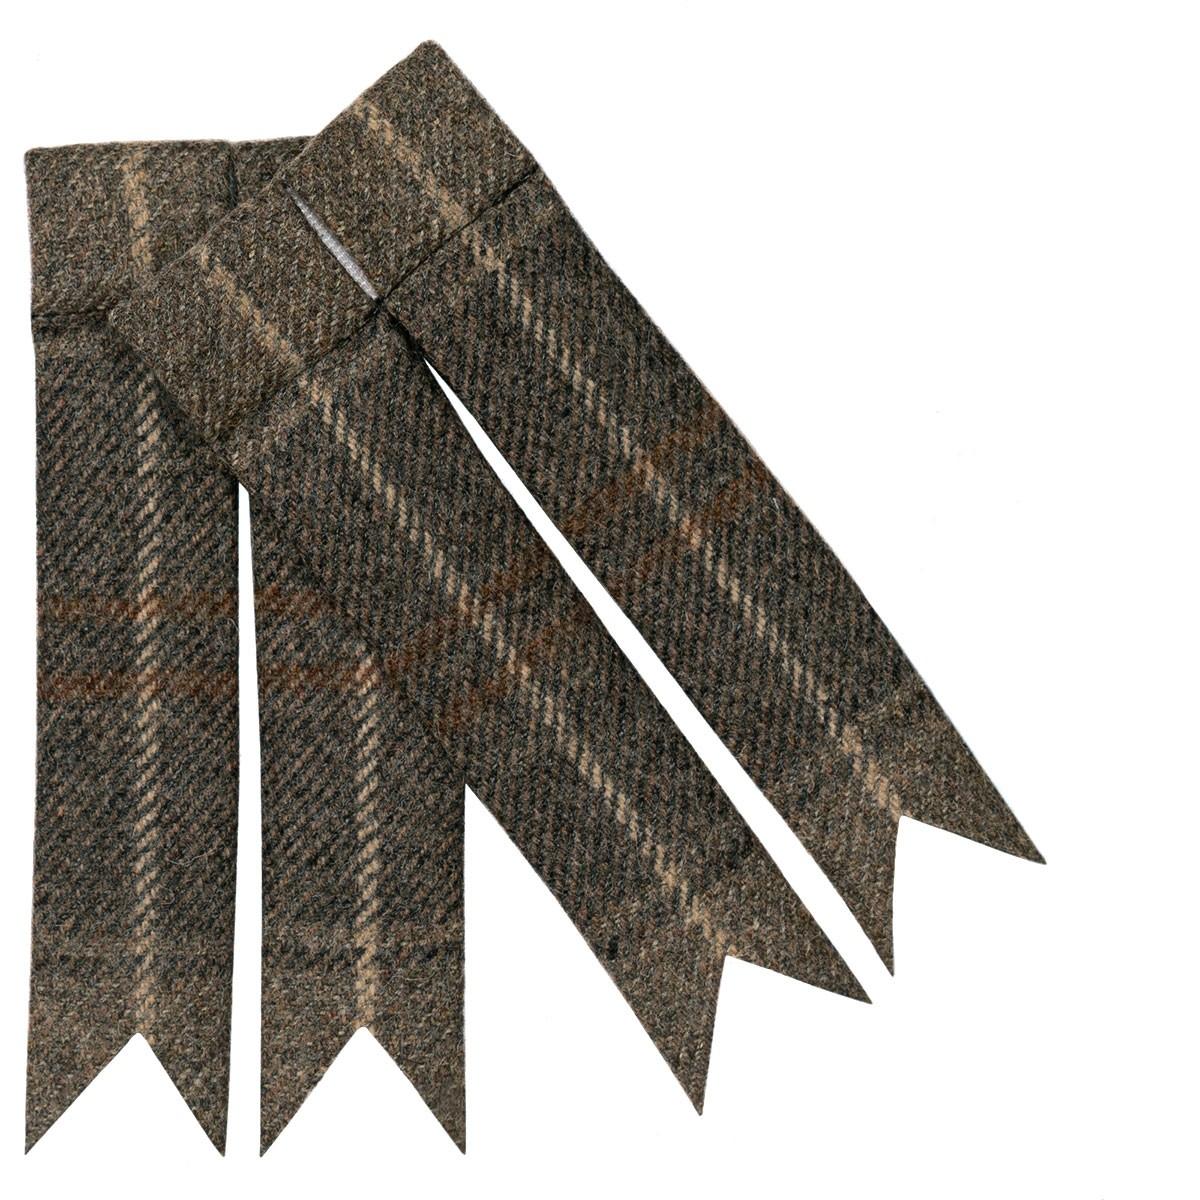 Made to Order Waverley Mediumweight Tweed Flashes